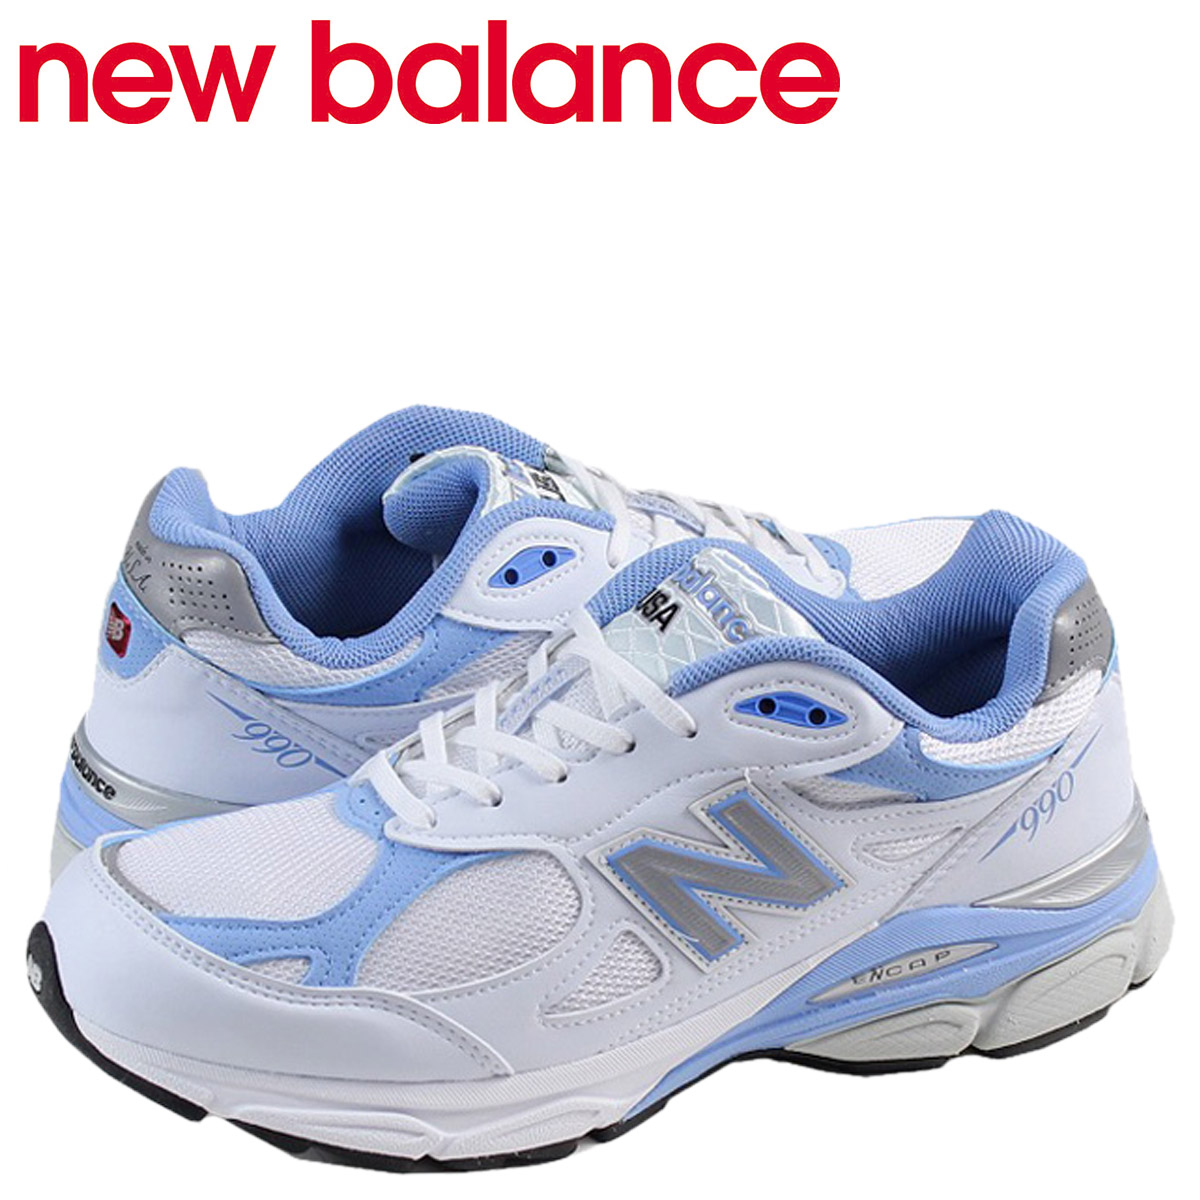 ALLSPORTS: new balance 996 MRL996AG men gap Dis New Balance